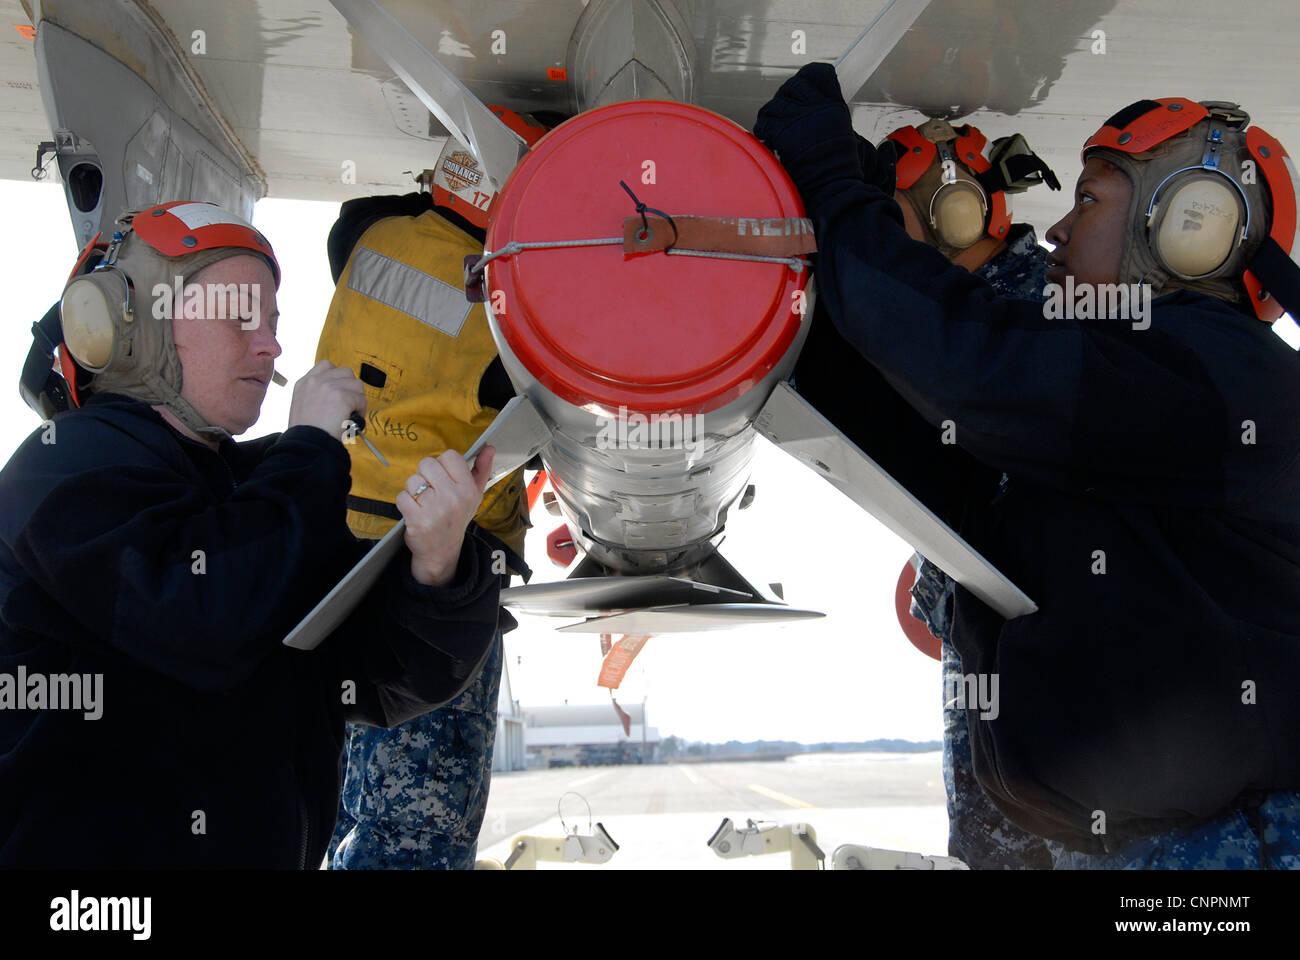 NAVAL AIR FACILITY MISAWA, Japan (April 21, 2012) – Aviation Ordnanceman team, attached to Patrol Squadron (VP) Stock Photo